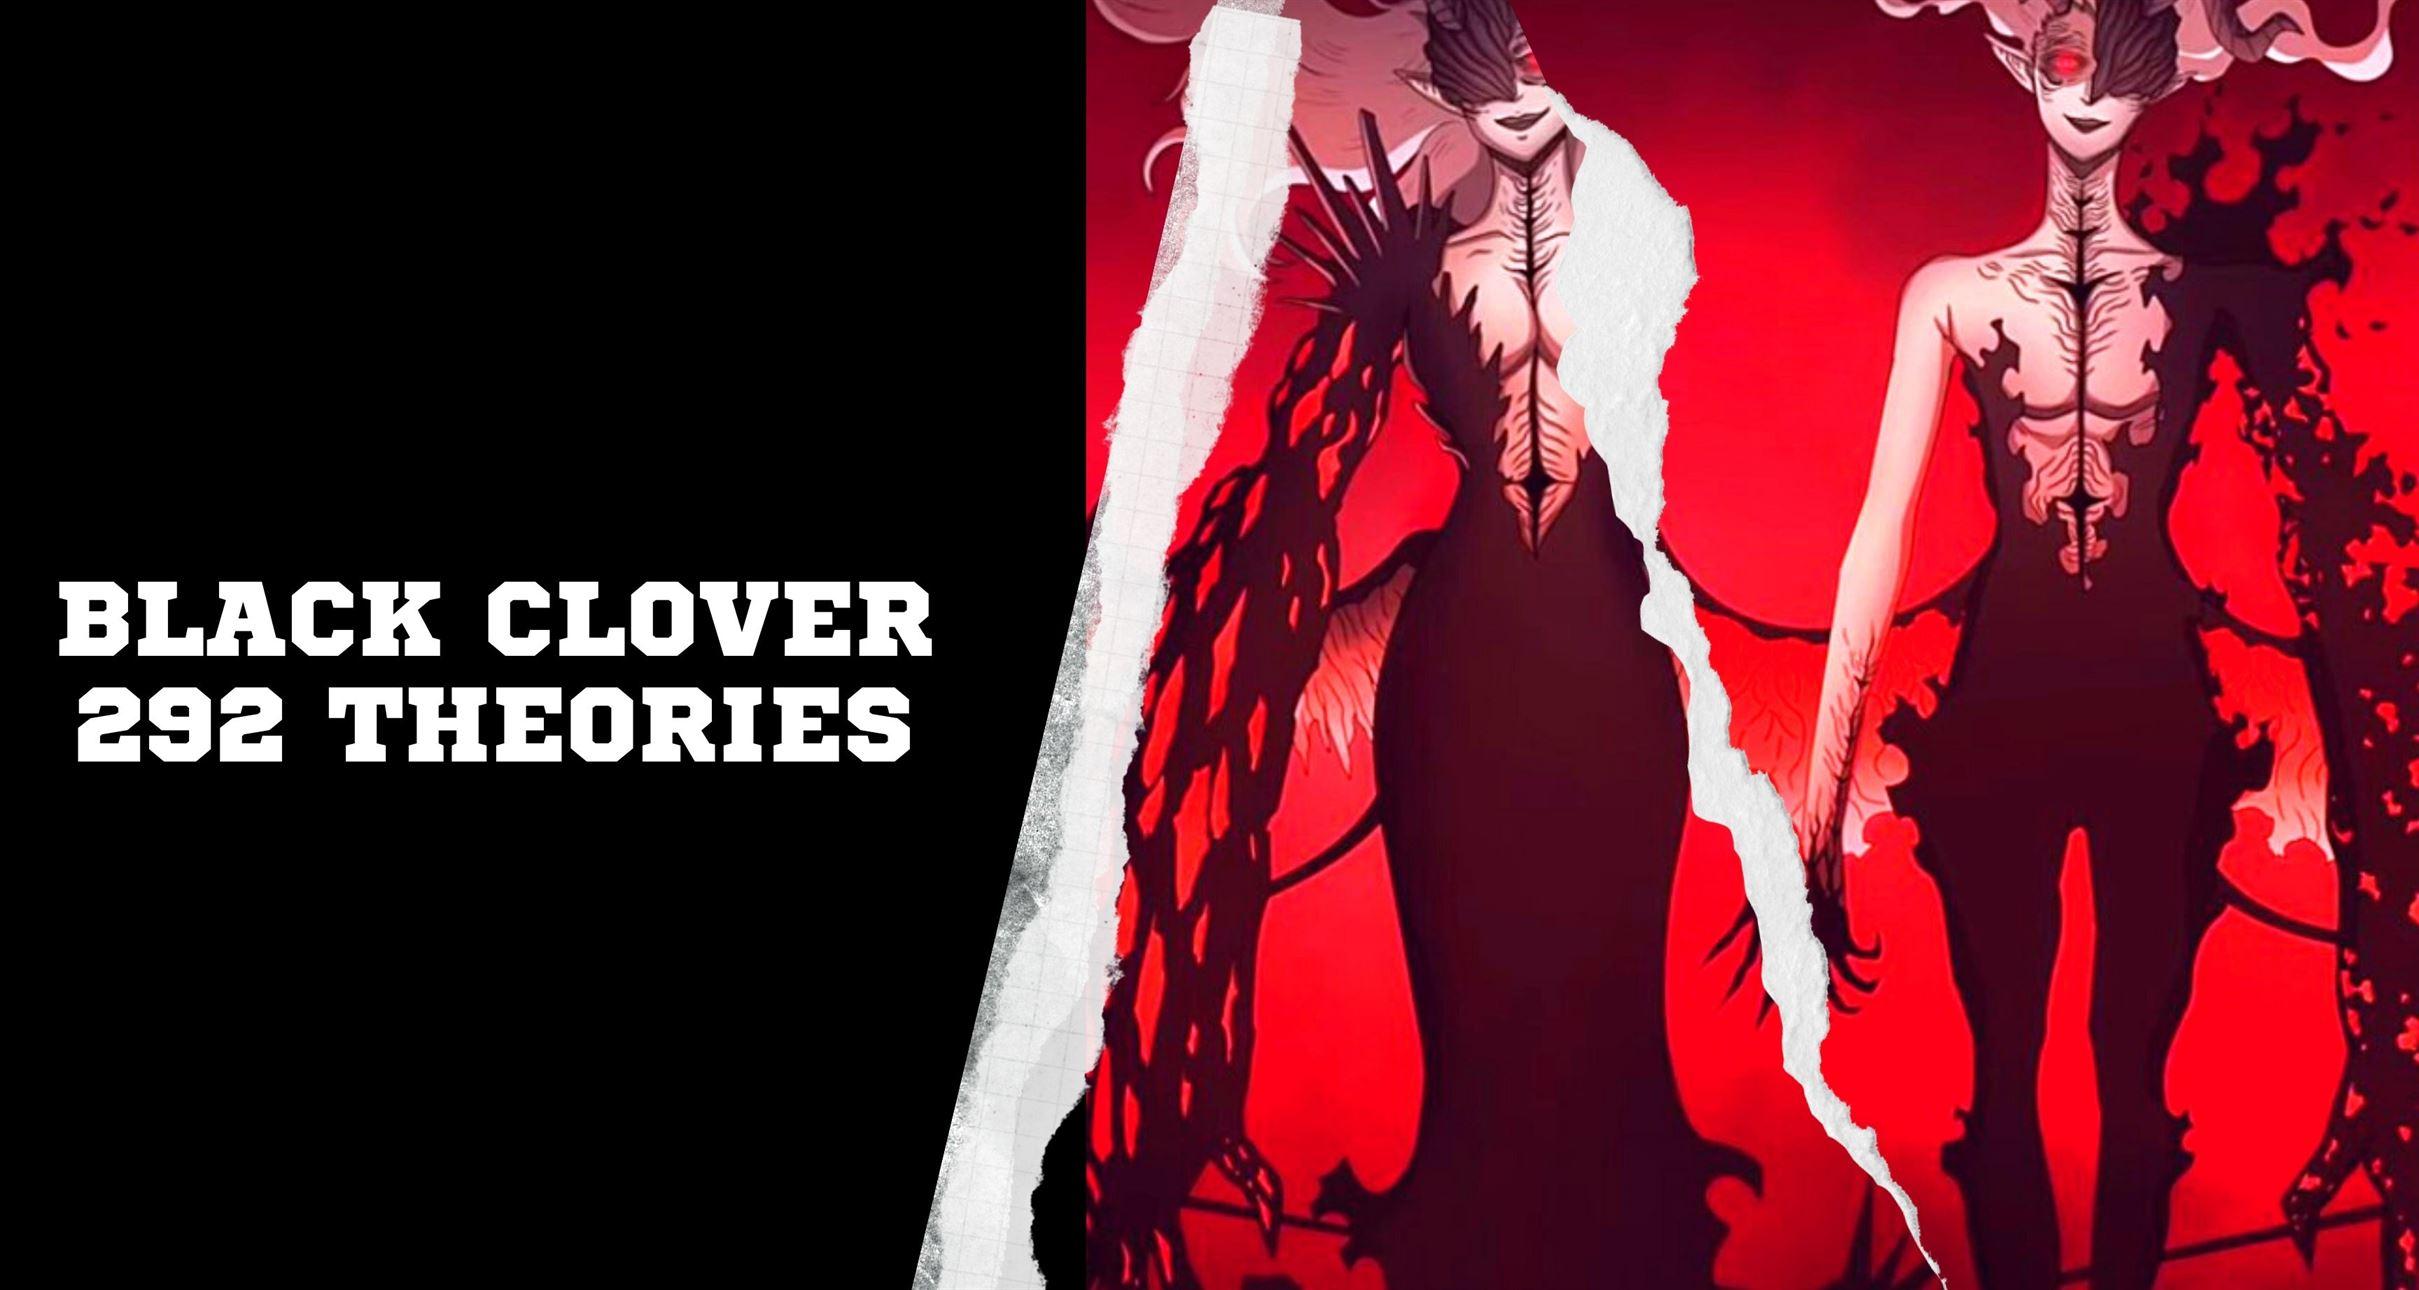 Black Clover 292 Theories date